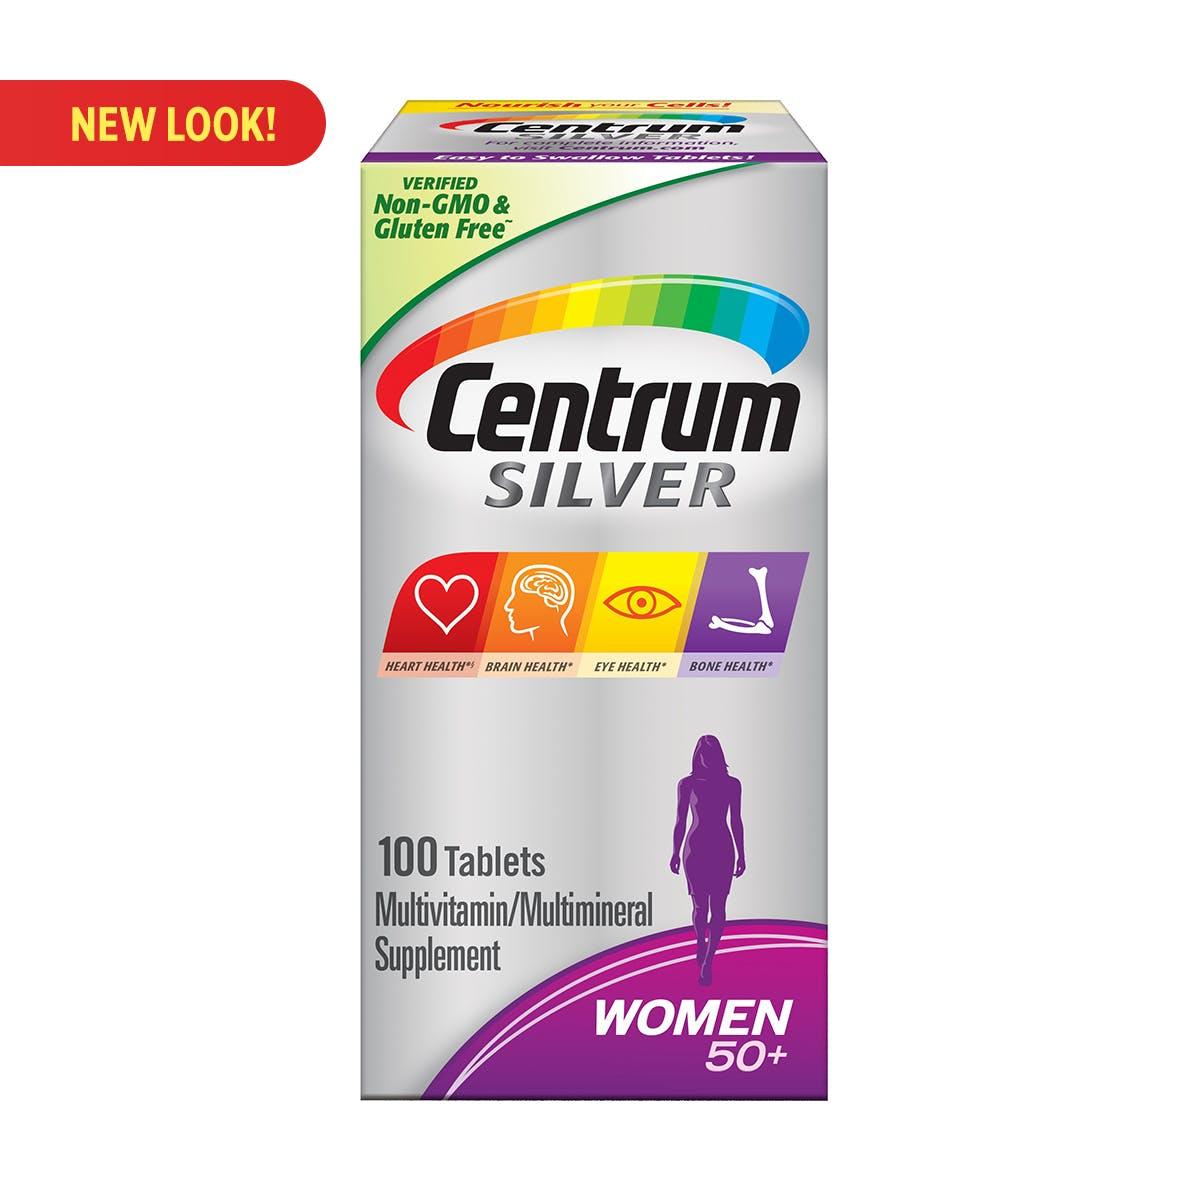 Box of Centrum Silver Womens multivitamins